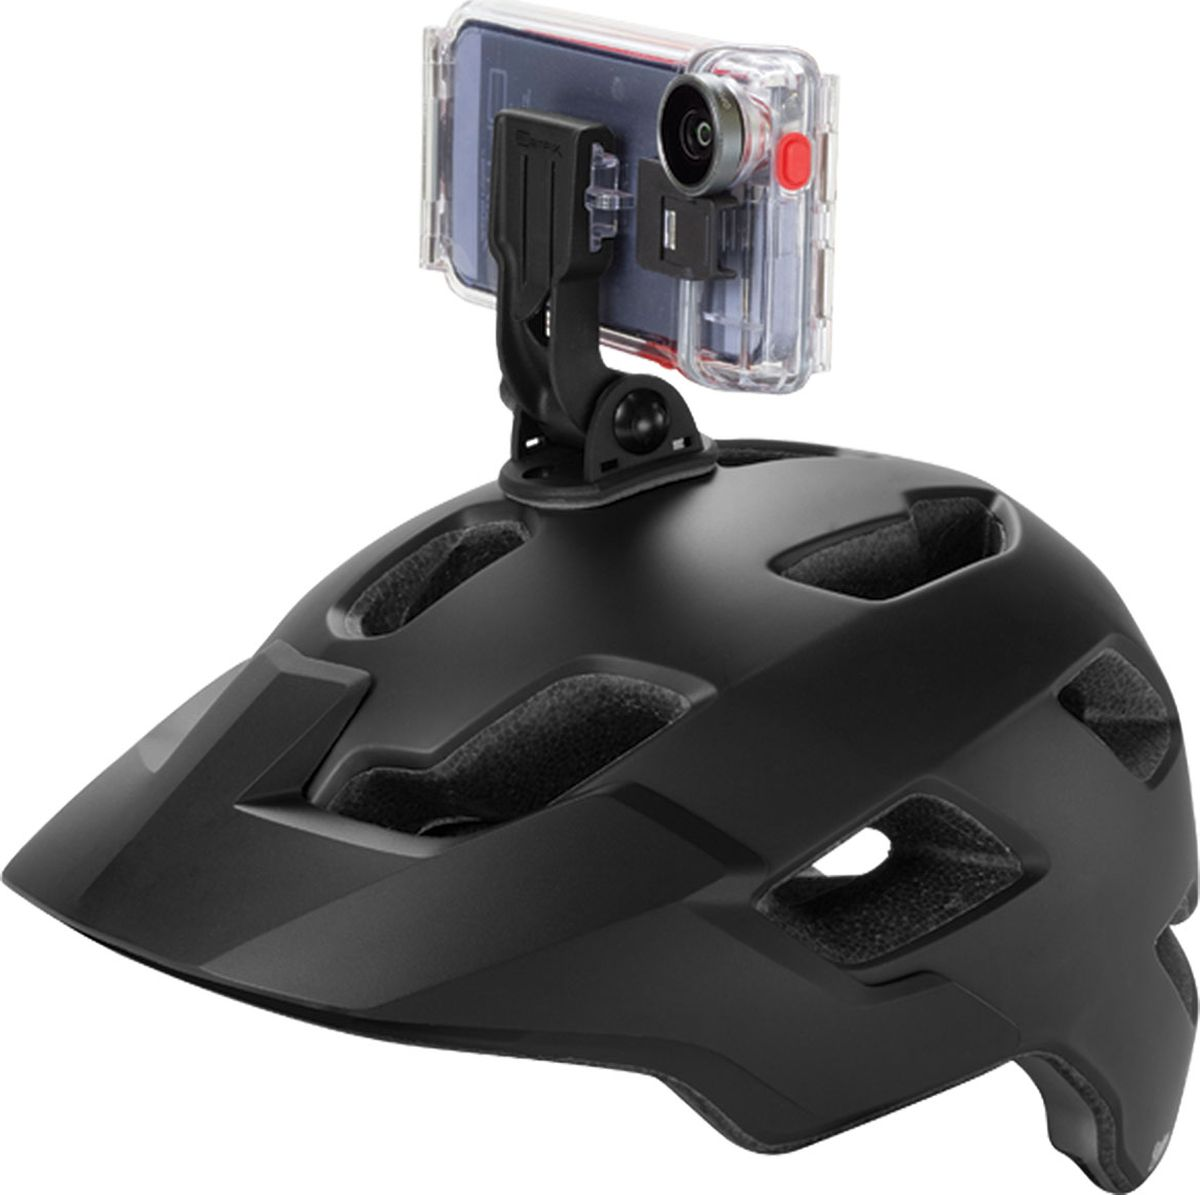 Optrix FS-94696, Black крепление для смартфона на шлем